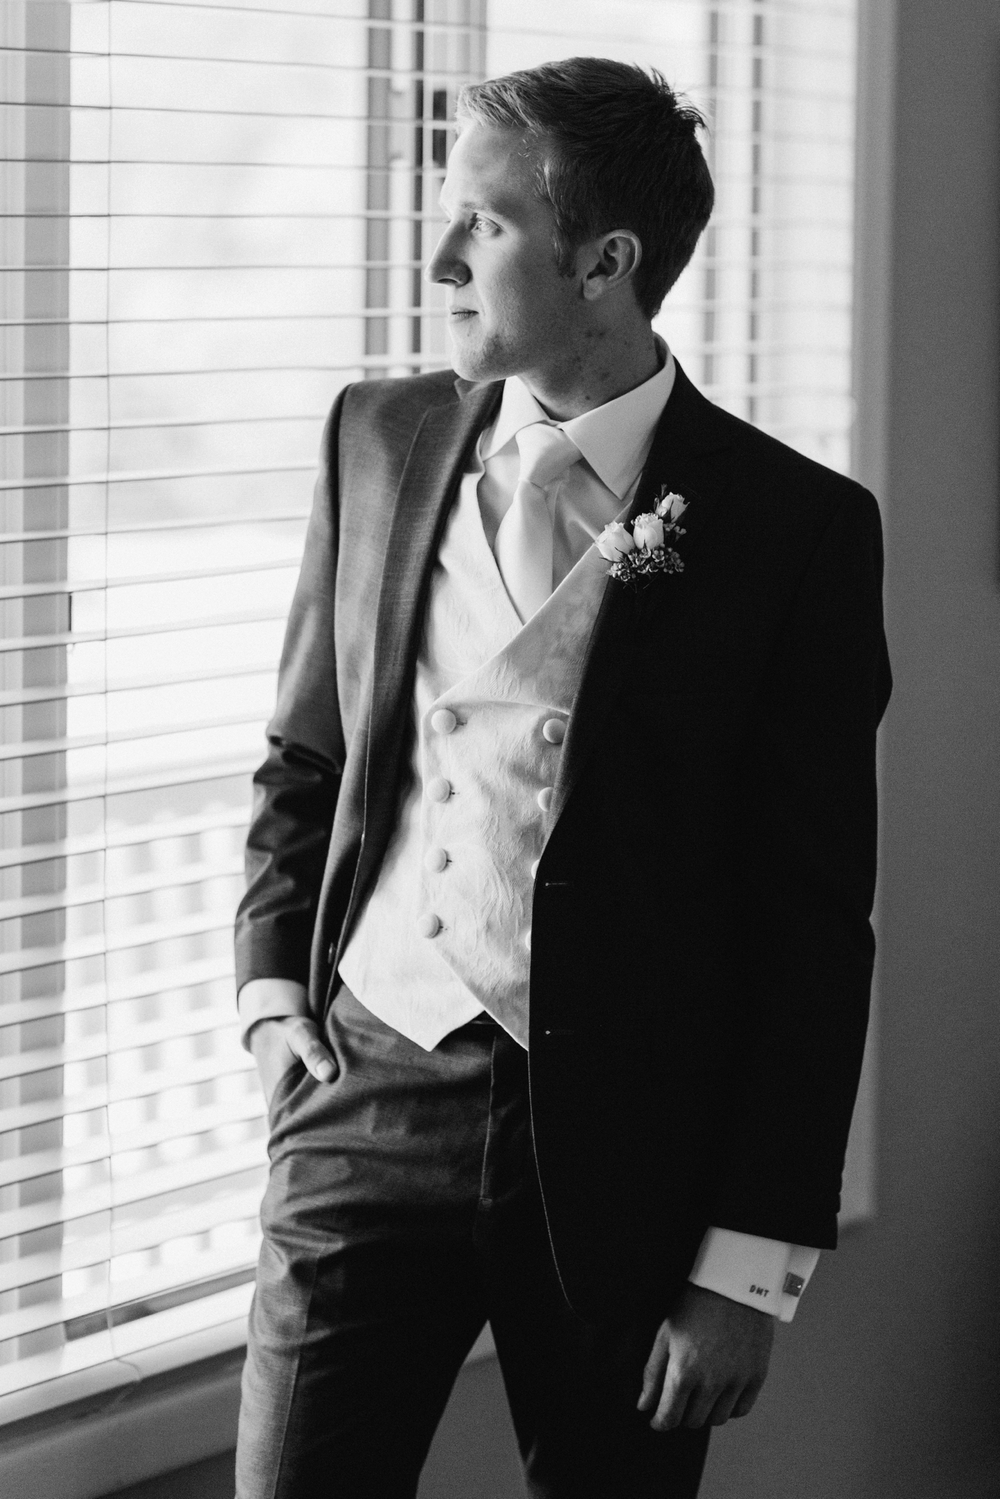 NCR_Country_Club_Kettering_Ohio_Wedding_Photography_Chloe_Luka_Photography_7110.jpg